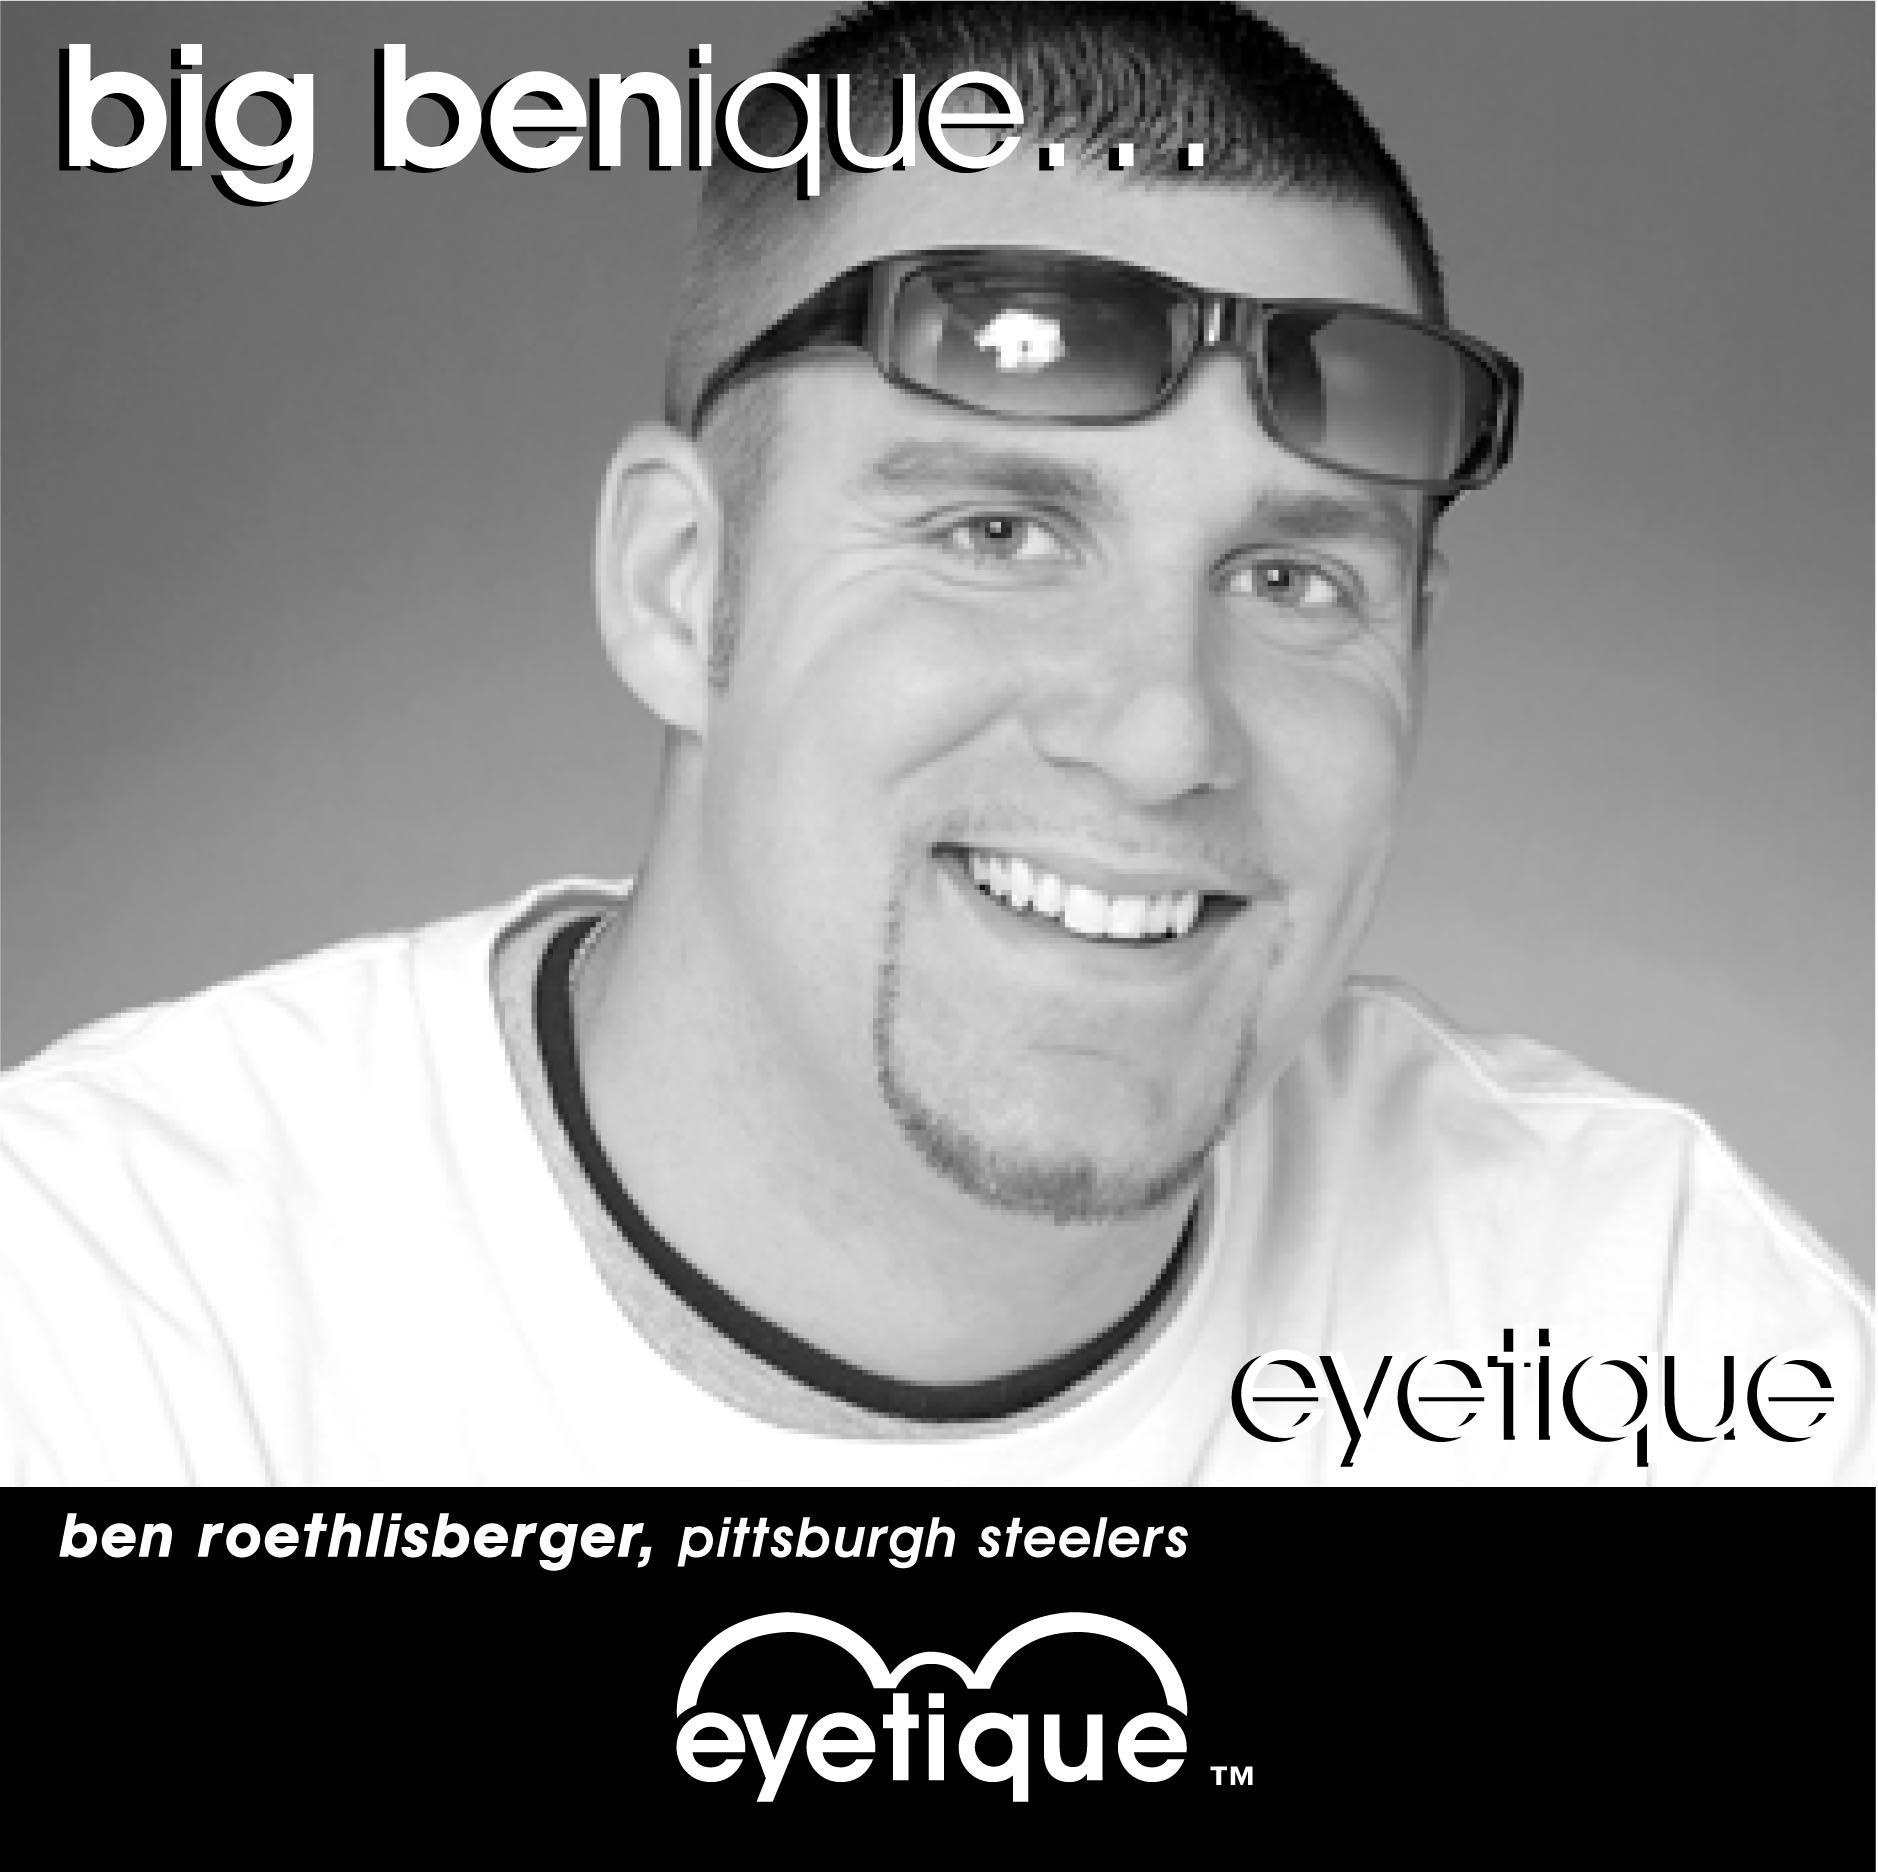 Ben Roethlisberger steelers pittsburgh eyetique